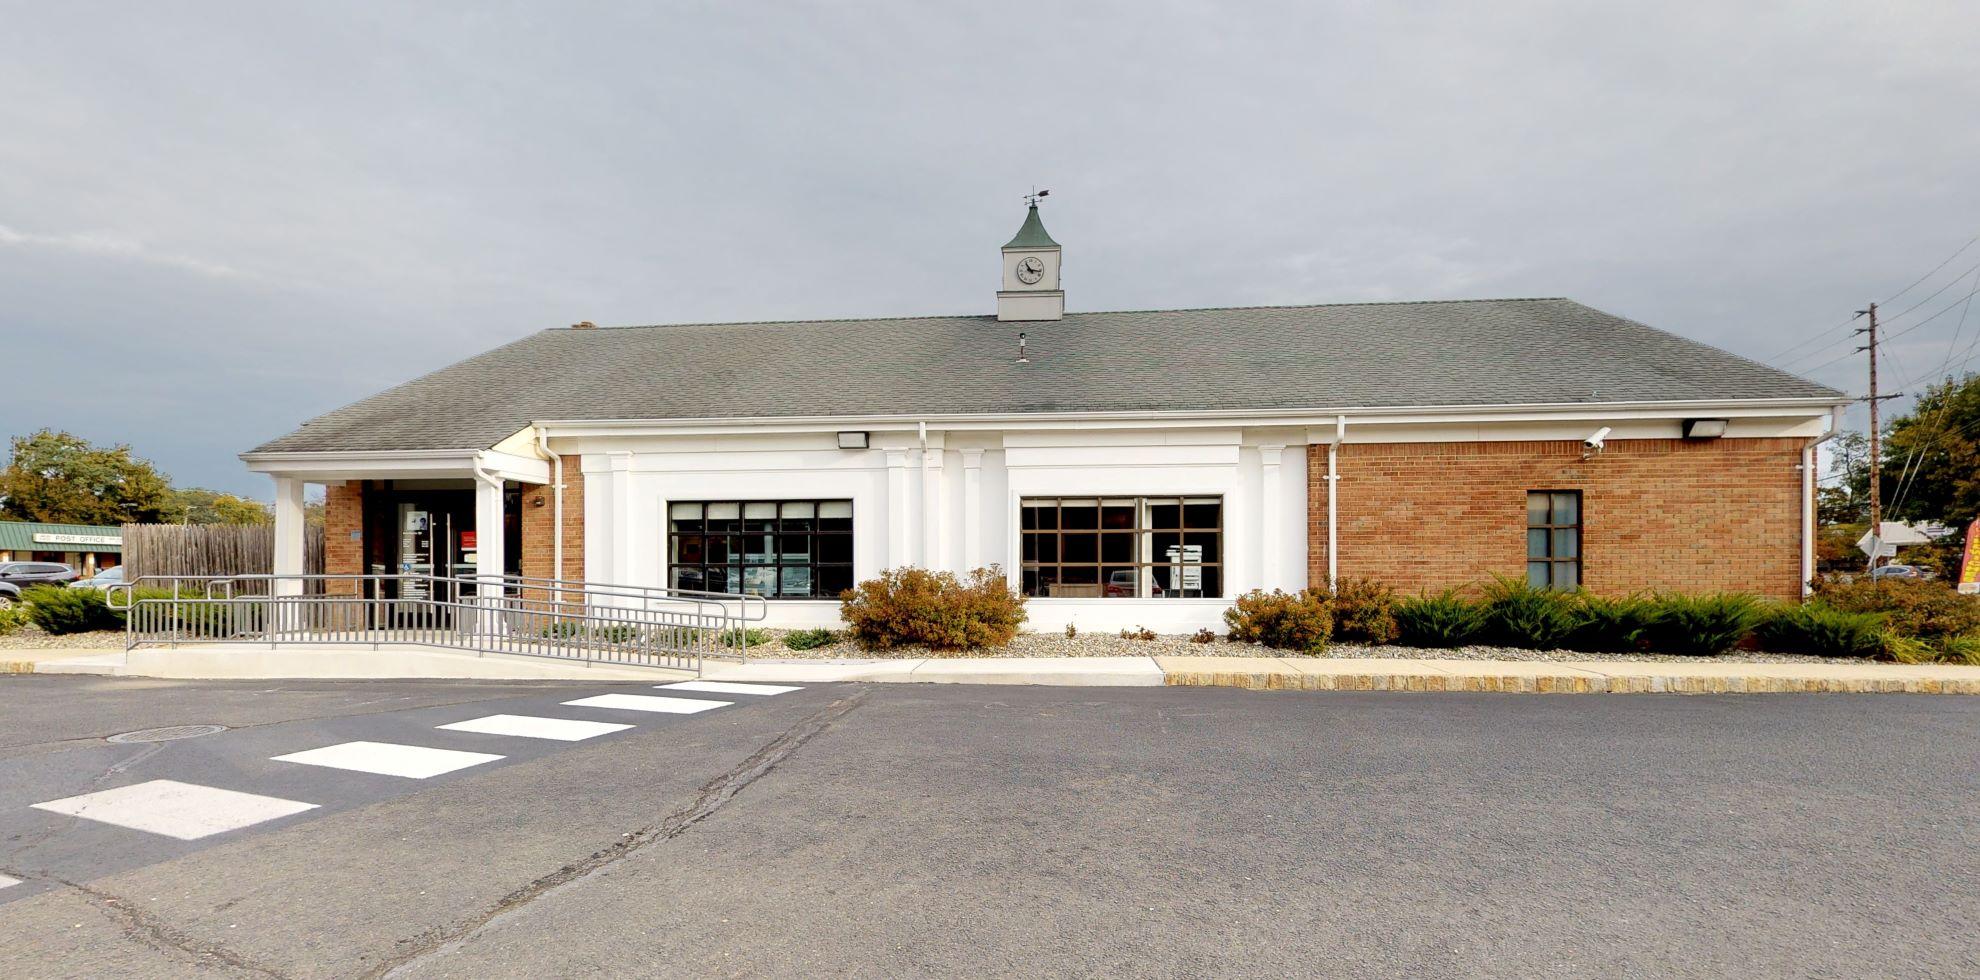 Bank of America financial center with drive-thru ATM | 6 S Main St, Marlboro, NJ 07746